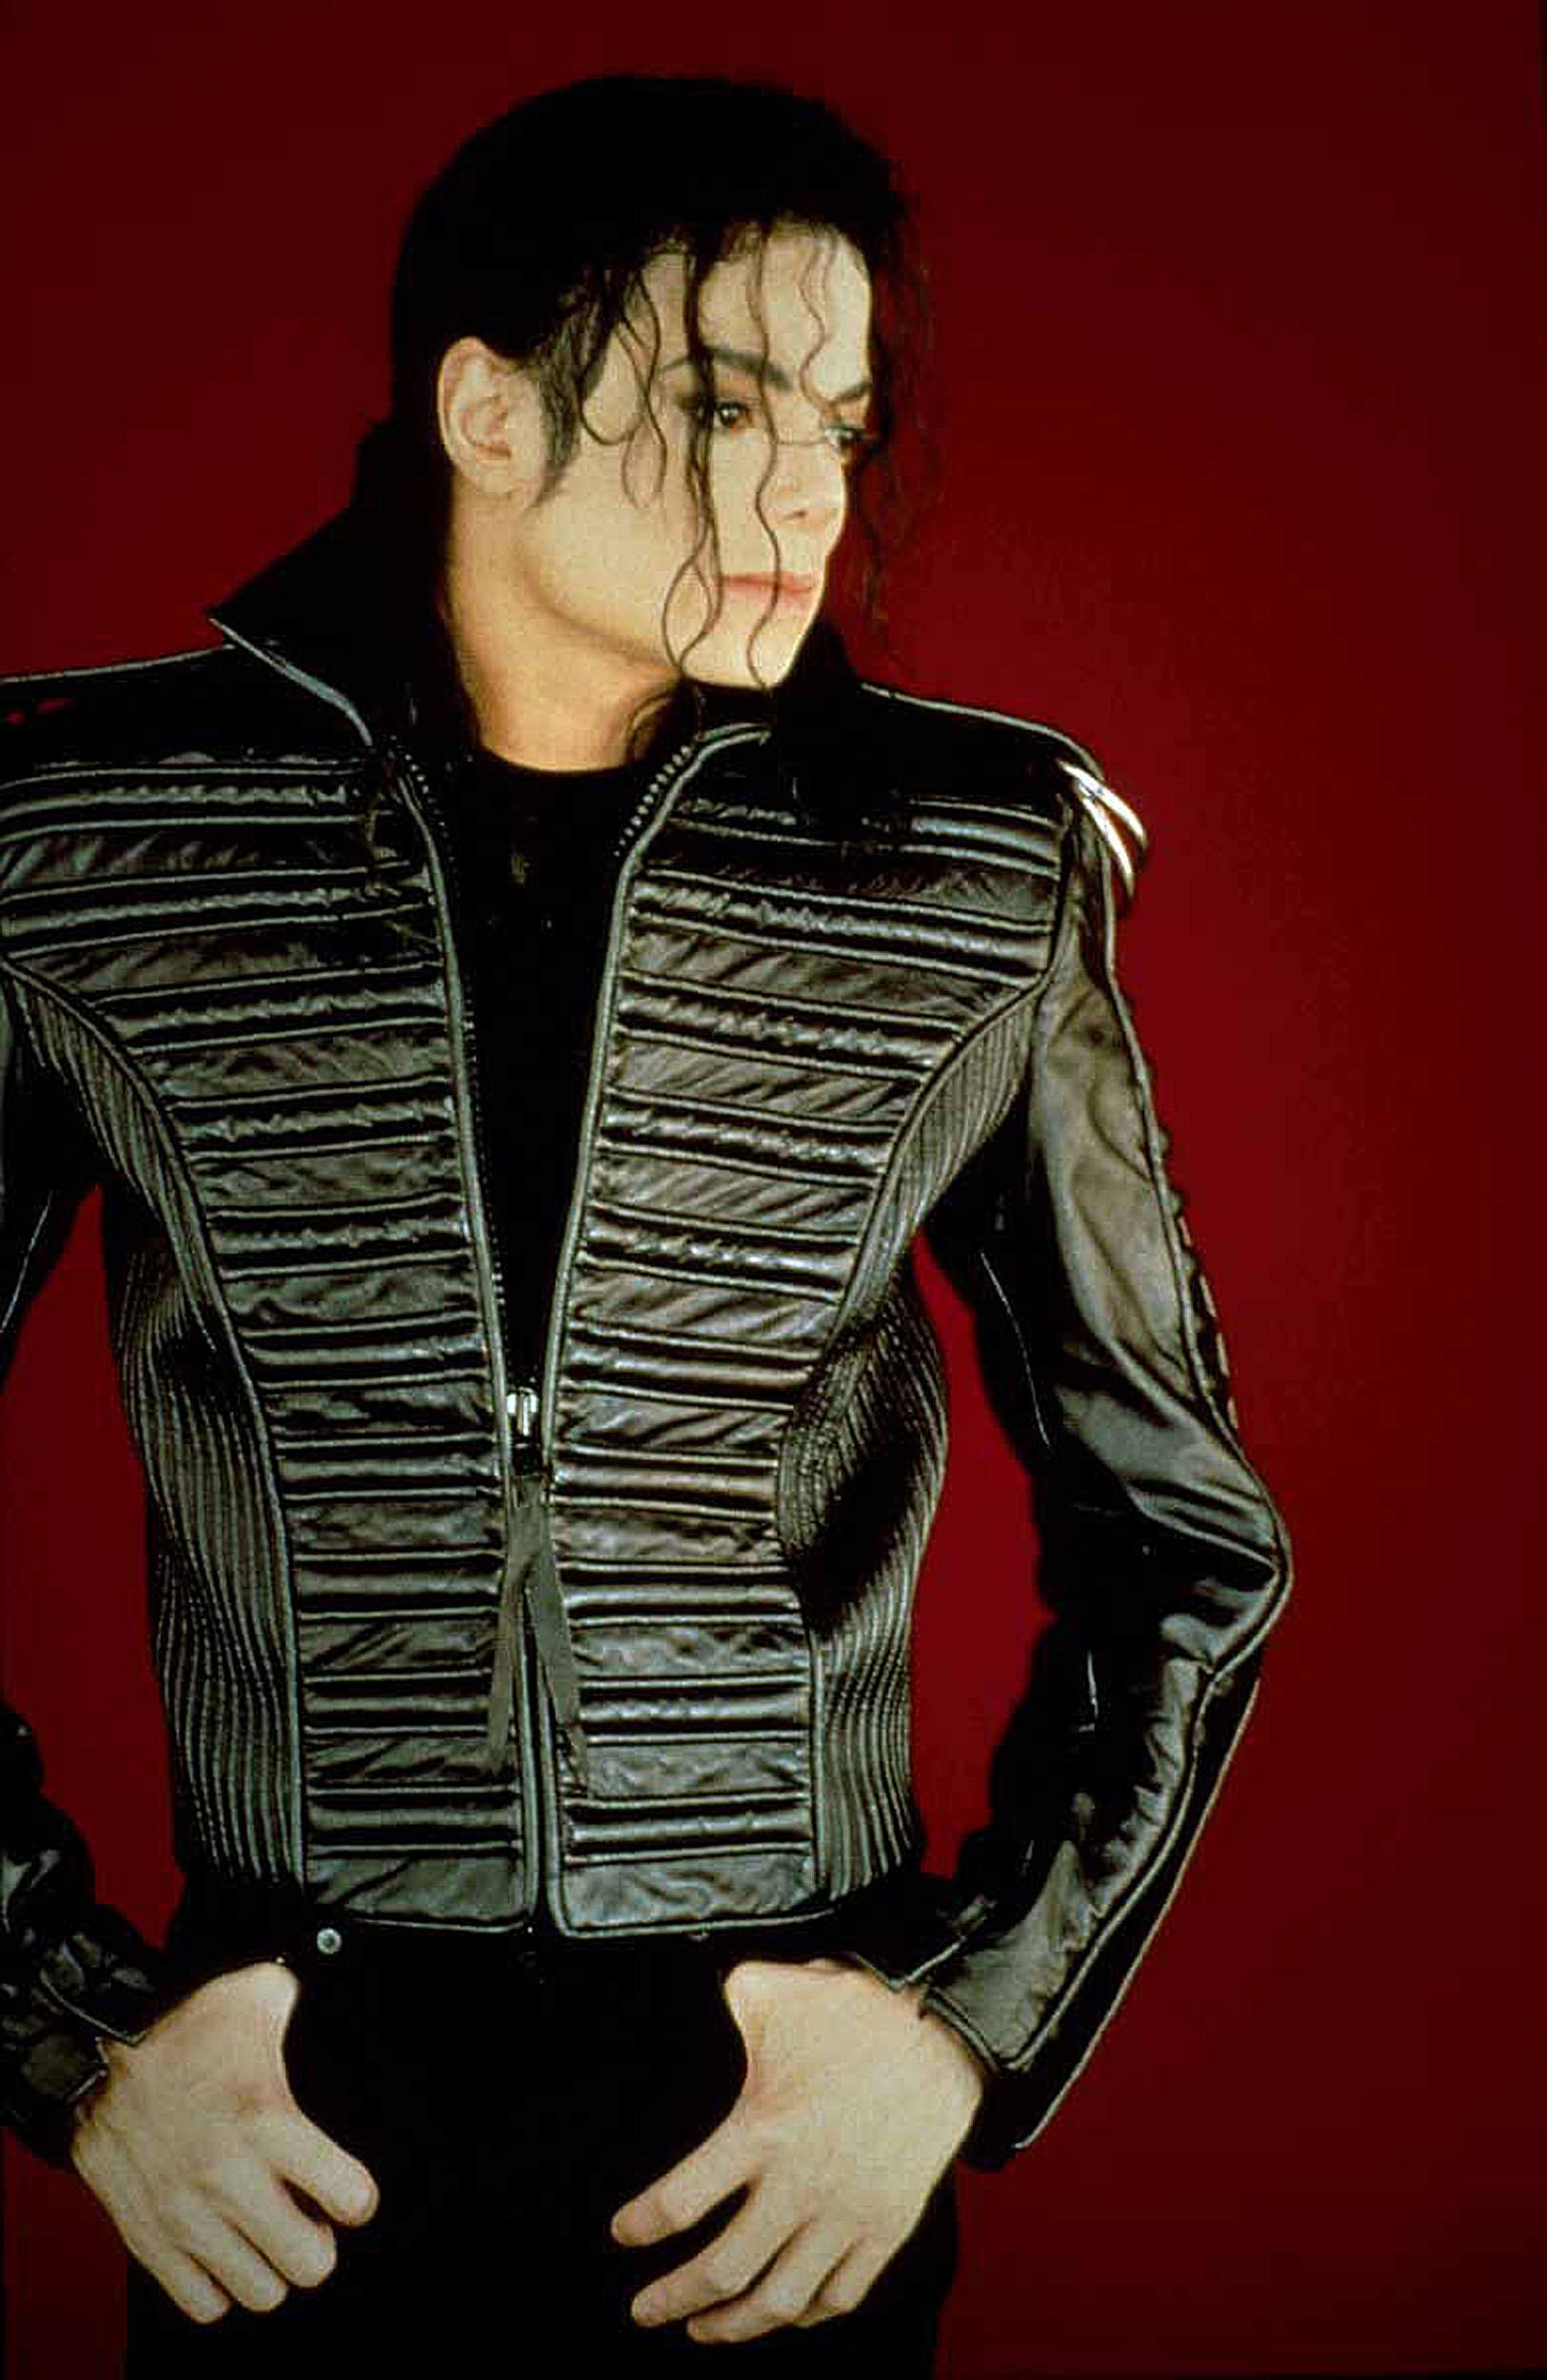 Michael Jackson - Blood on the Dance Floor